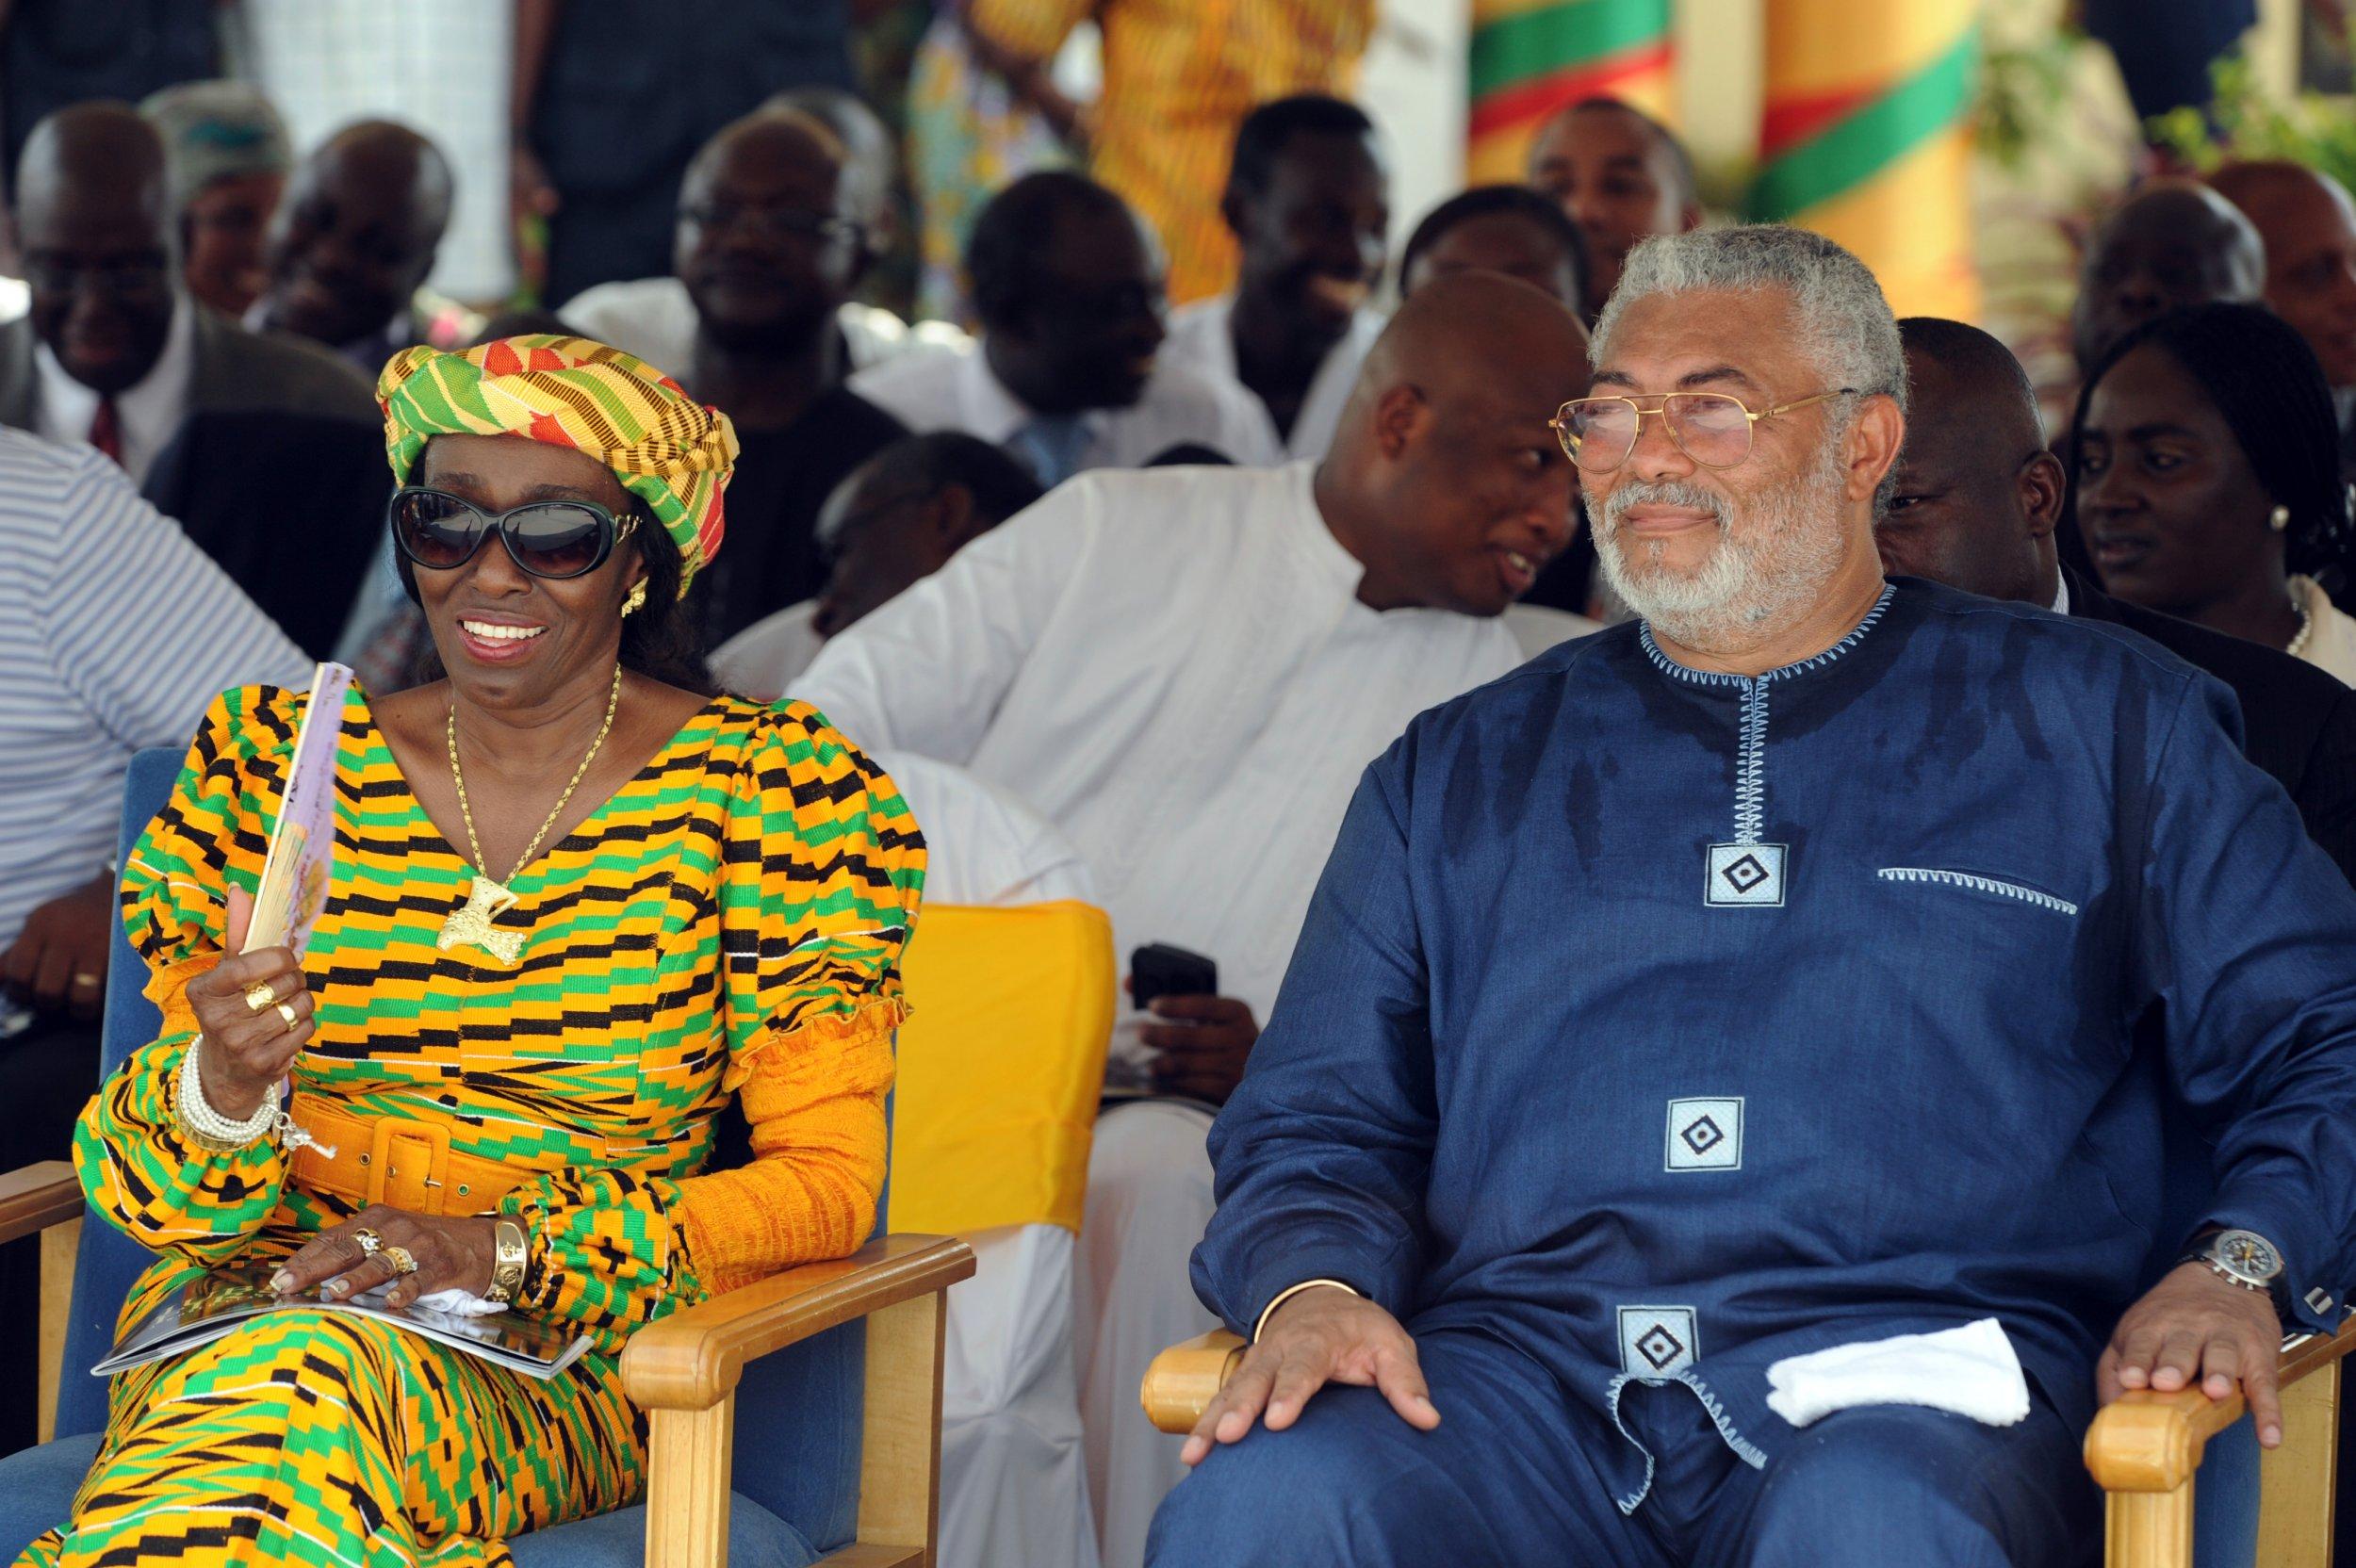 Nana Agyeman-Rawlings and Jerry Rawlings